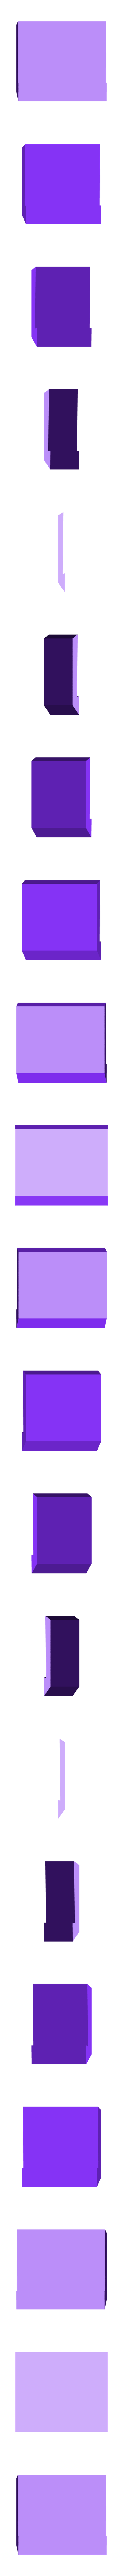 aframe_roof2.stl Download free STL file Saxon Burh A frame hut • 3D print object, Earsling